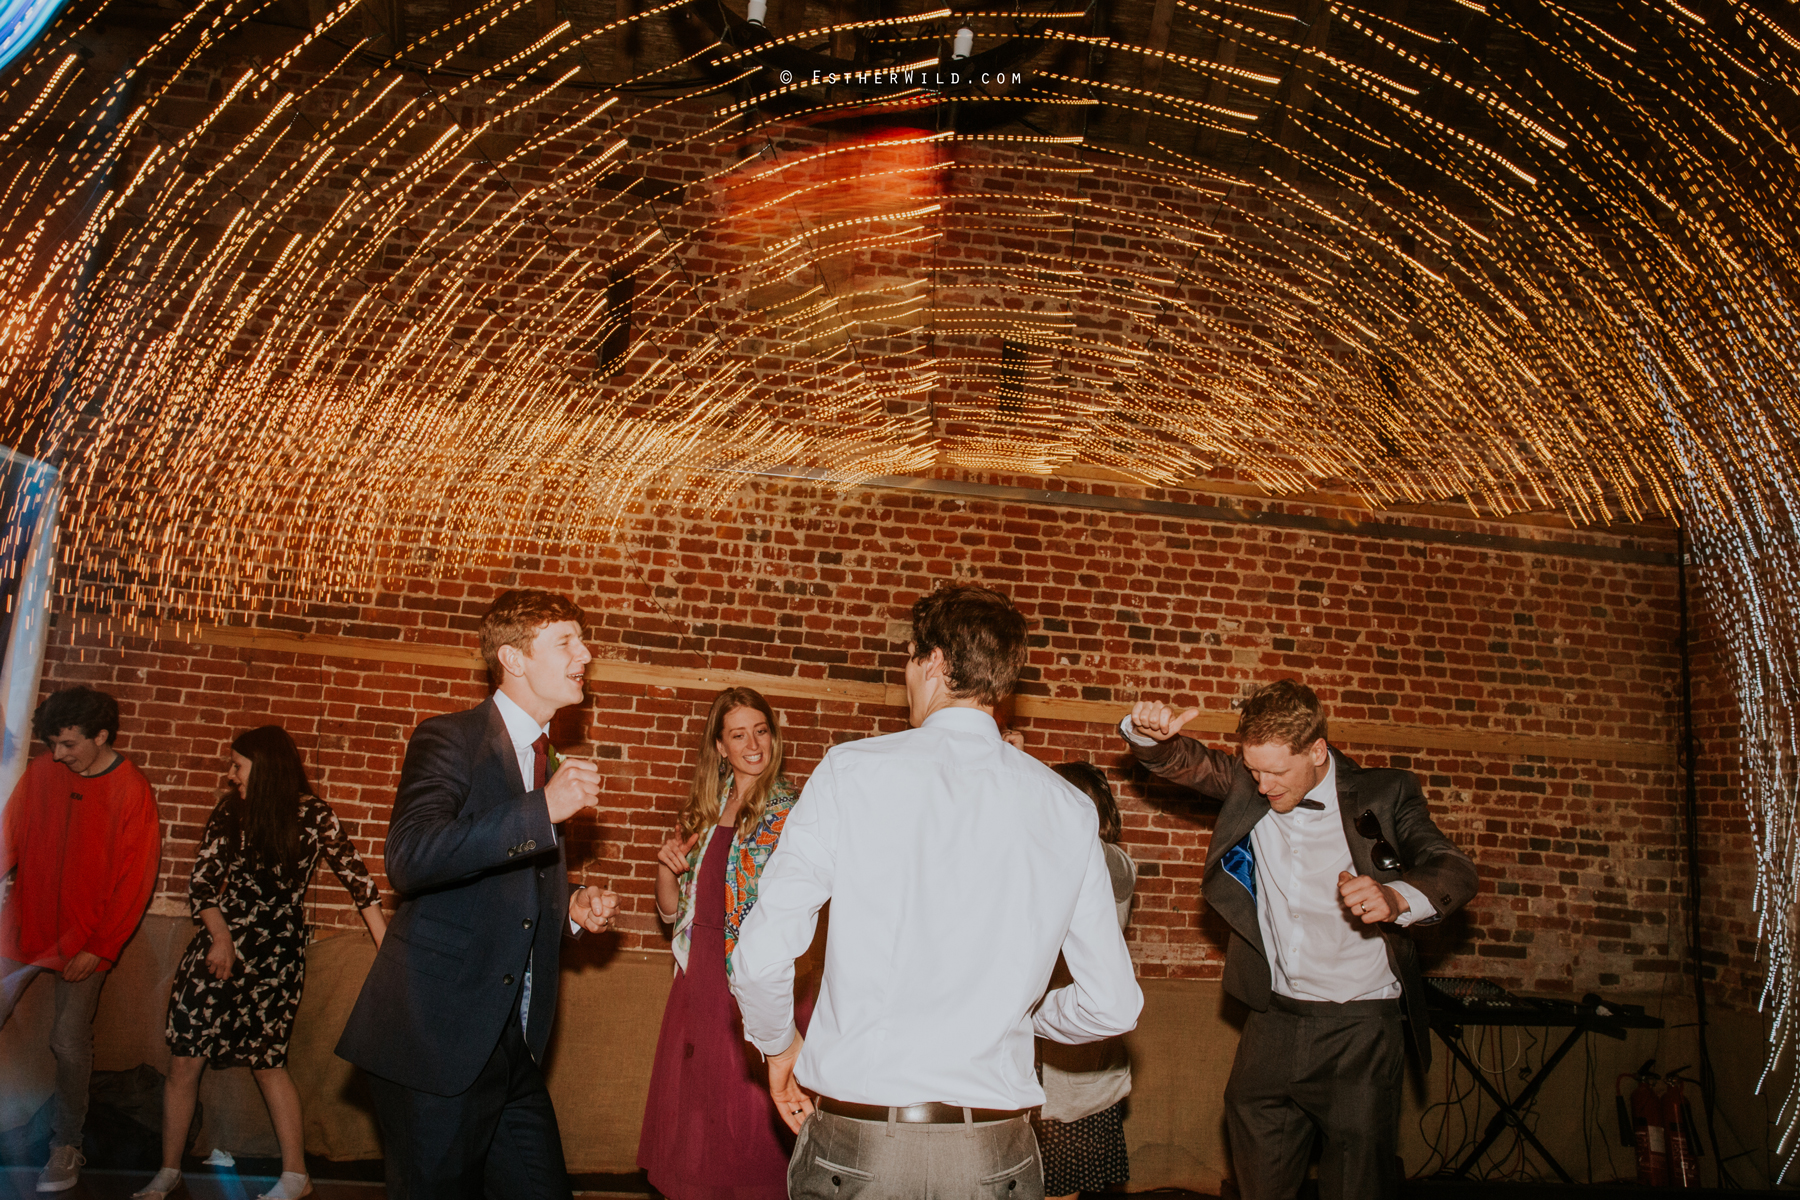 Glebe_Farm_Barn_Rustic_Norfolk_Wedding_Esther_Wild_Photographer_Copyright_IMG_3385.jpg